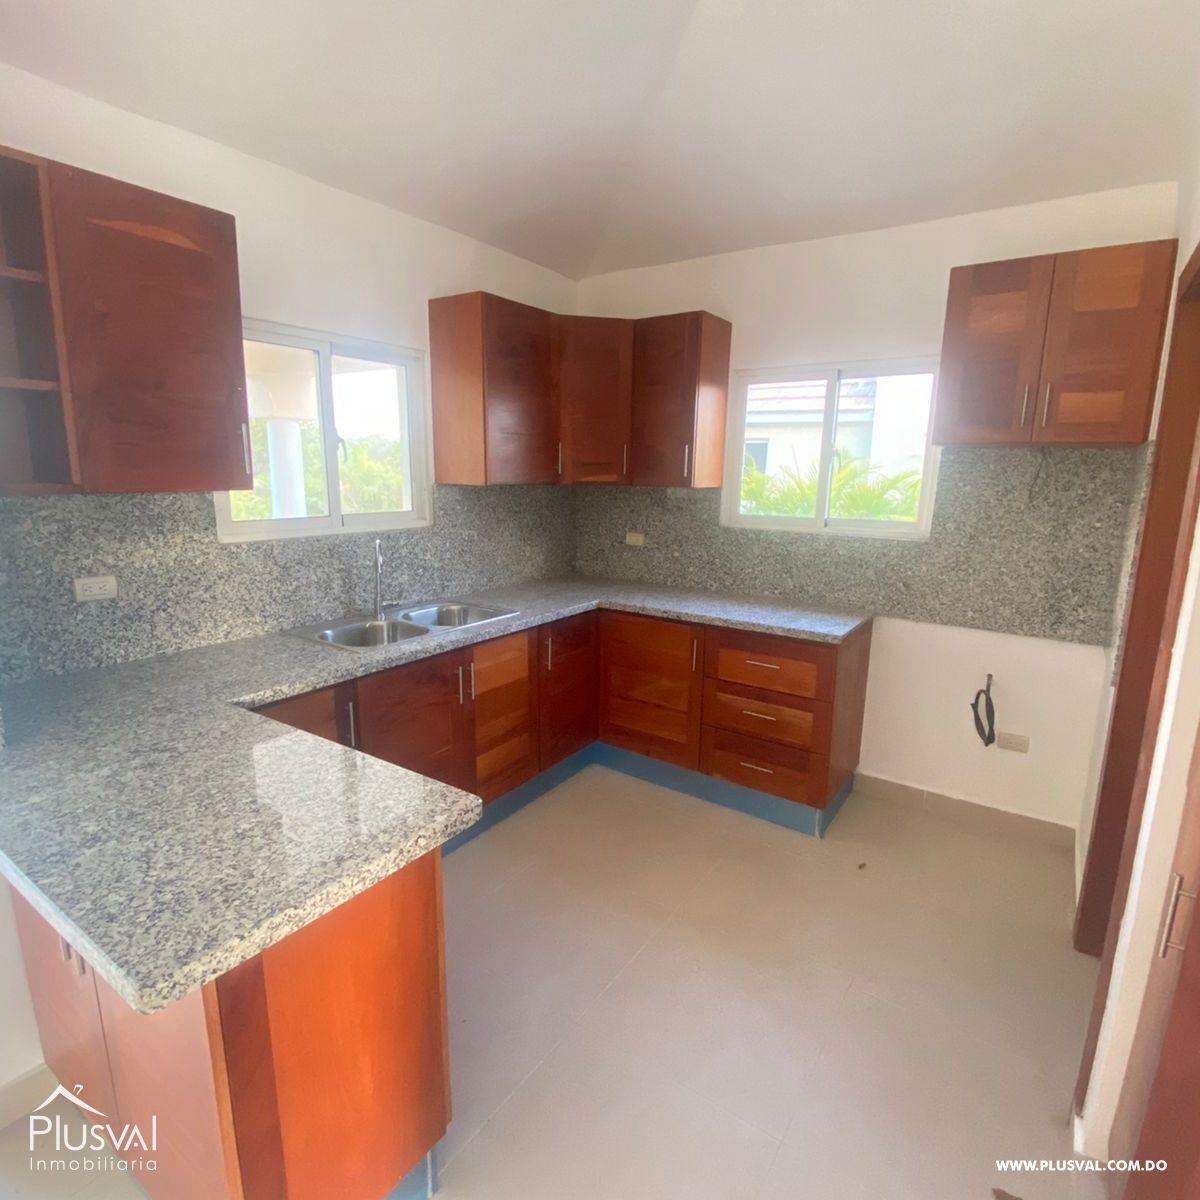 Proyecto exclusivo de casas con piscina en Punta Cana 174082